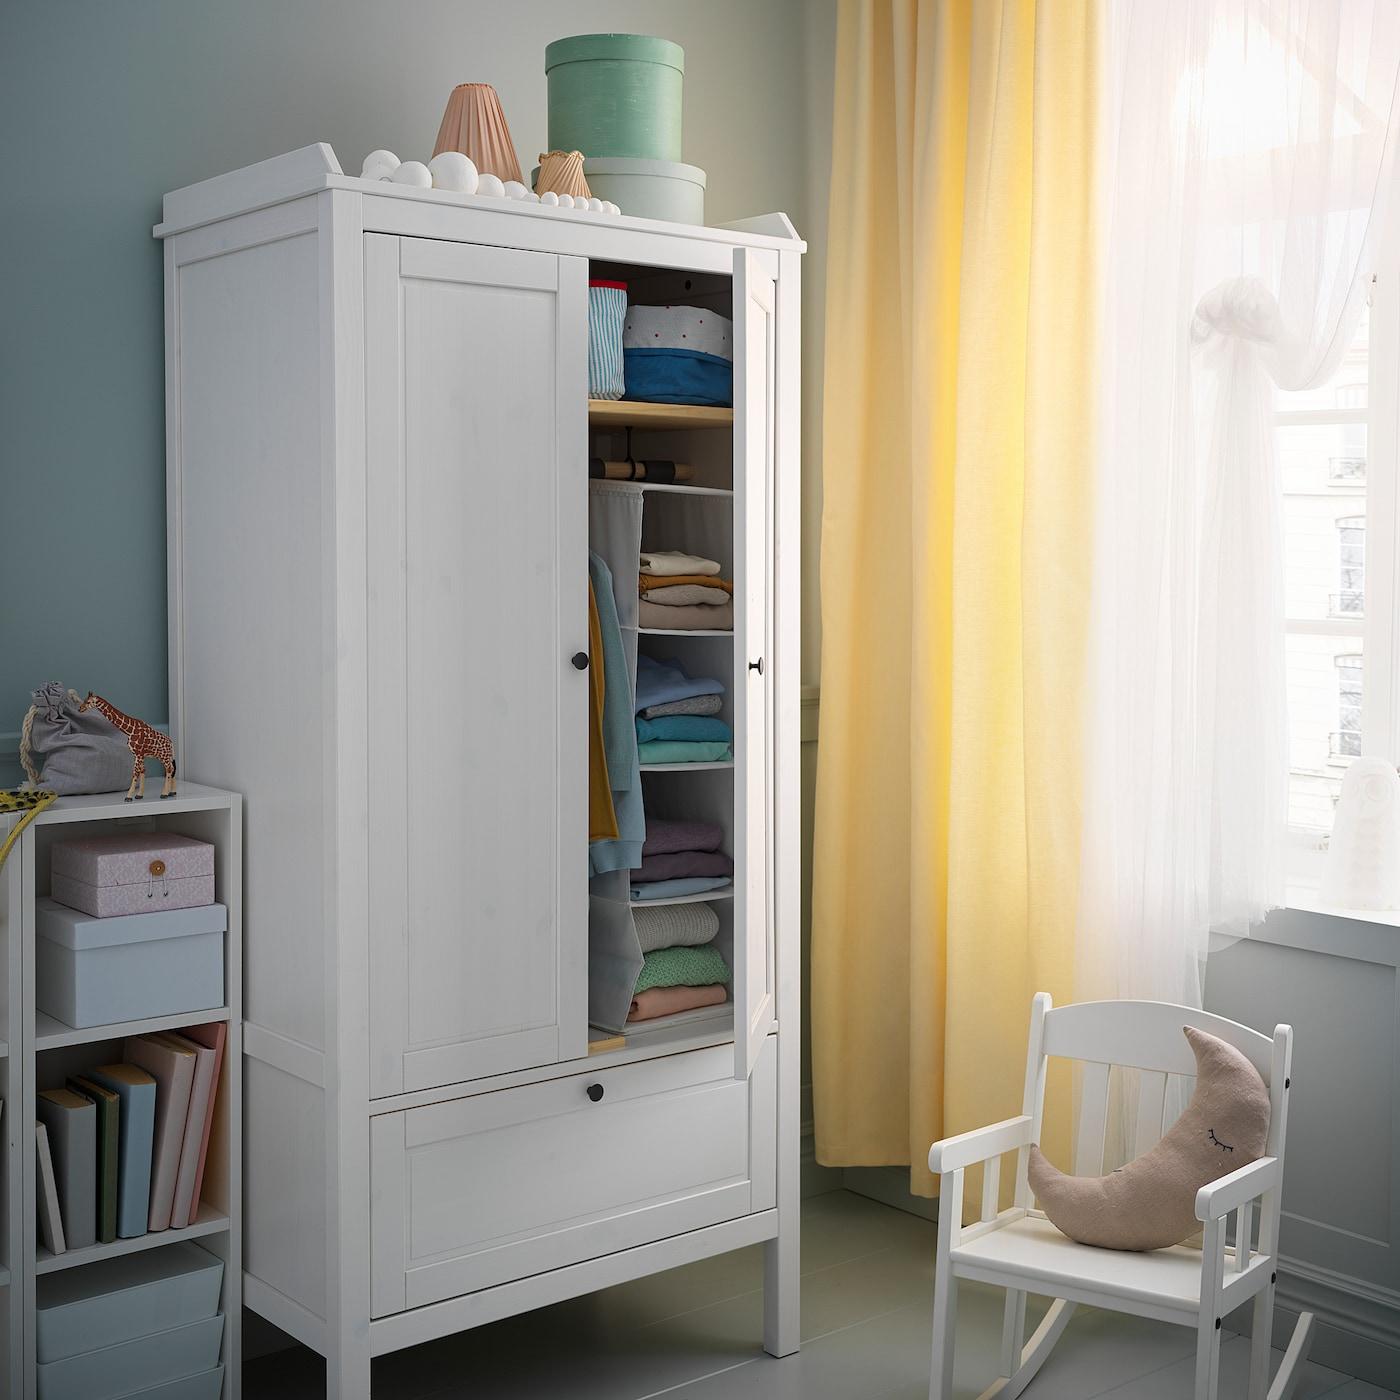 SUNDVIK Armario, blanco, 80x50x171 cm